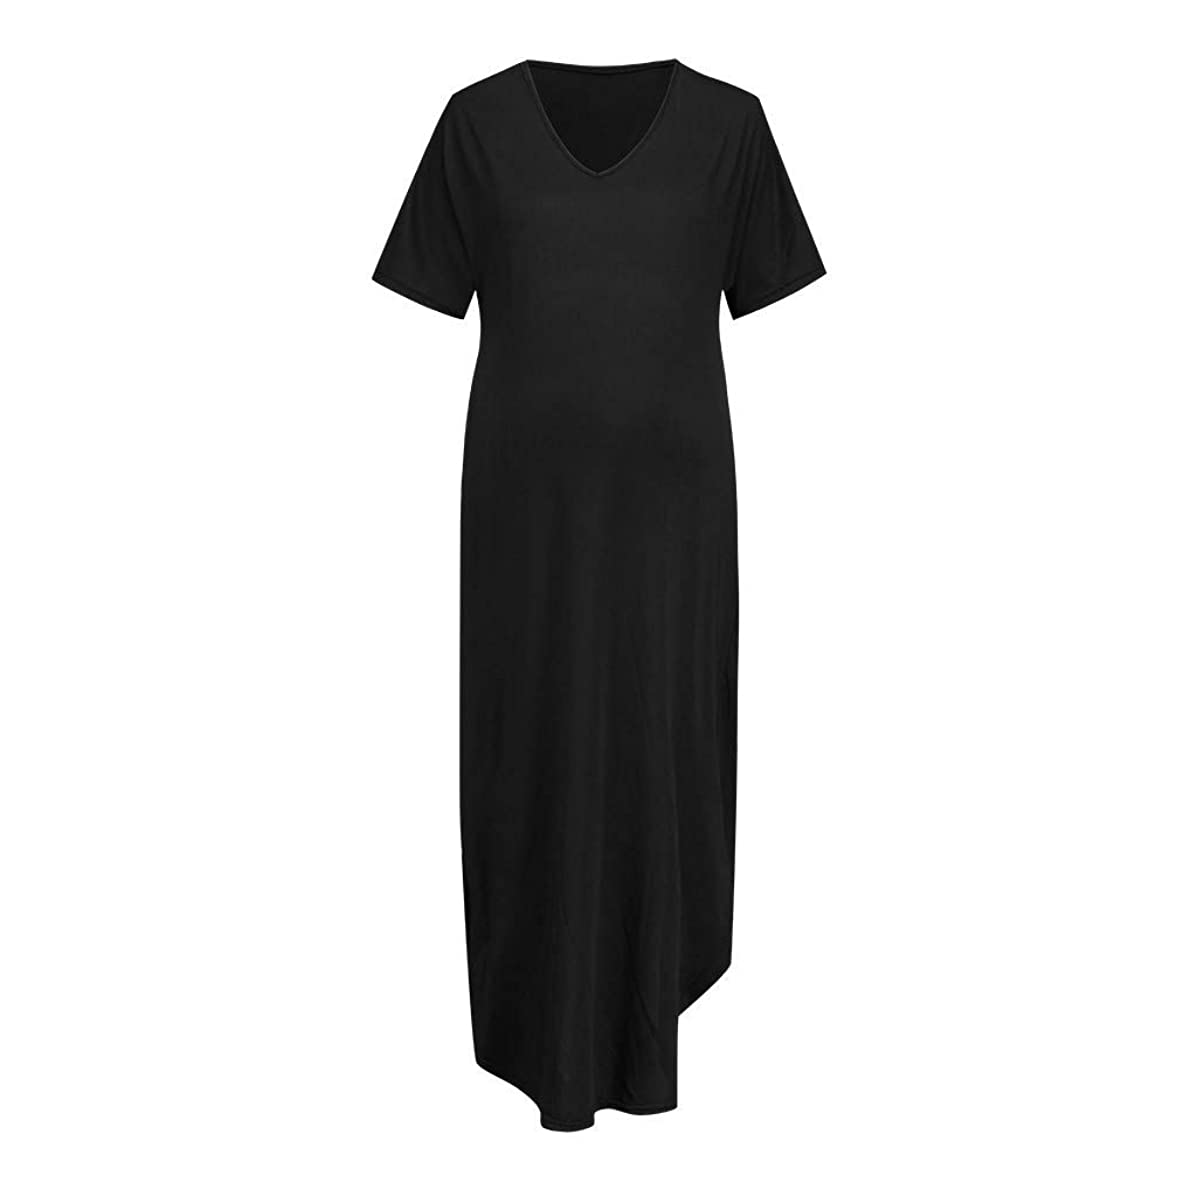 Genutery Women ? Womens Solid Color Maternity, Short Sleeve Open Fork Long Pregnancy Dresses V-Neck Plus Sizes Soft Sundress